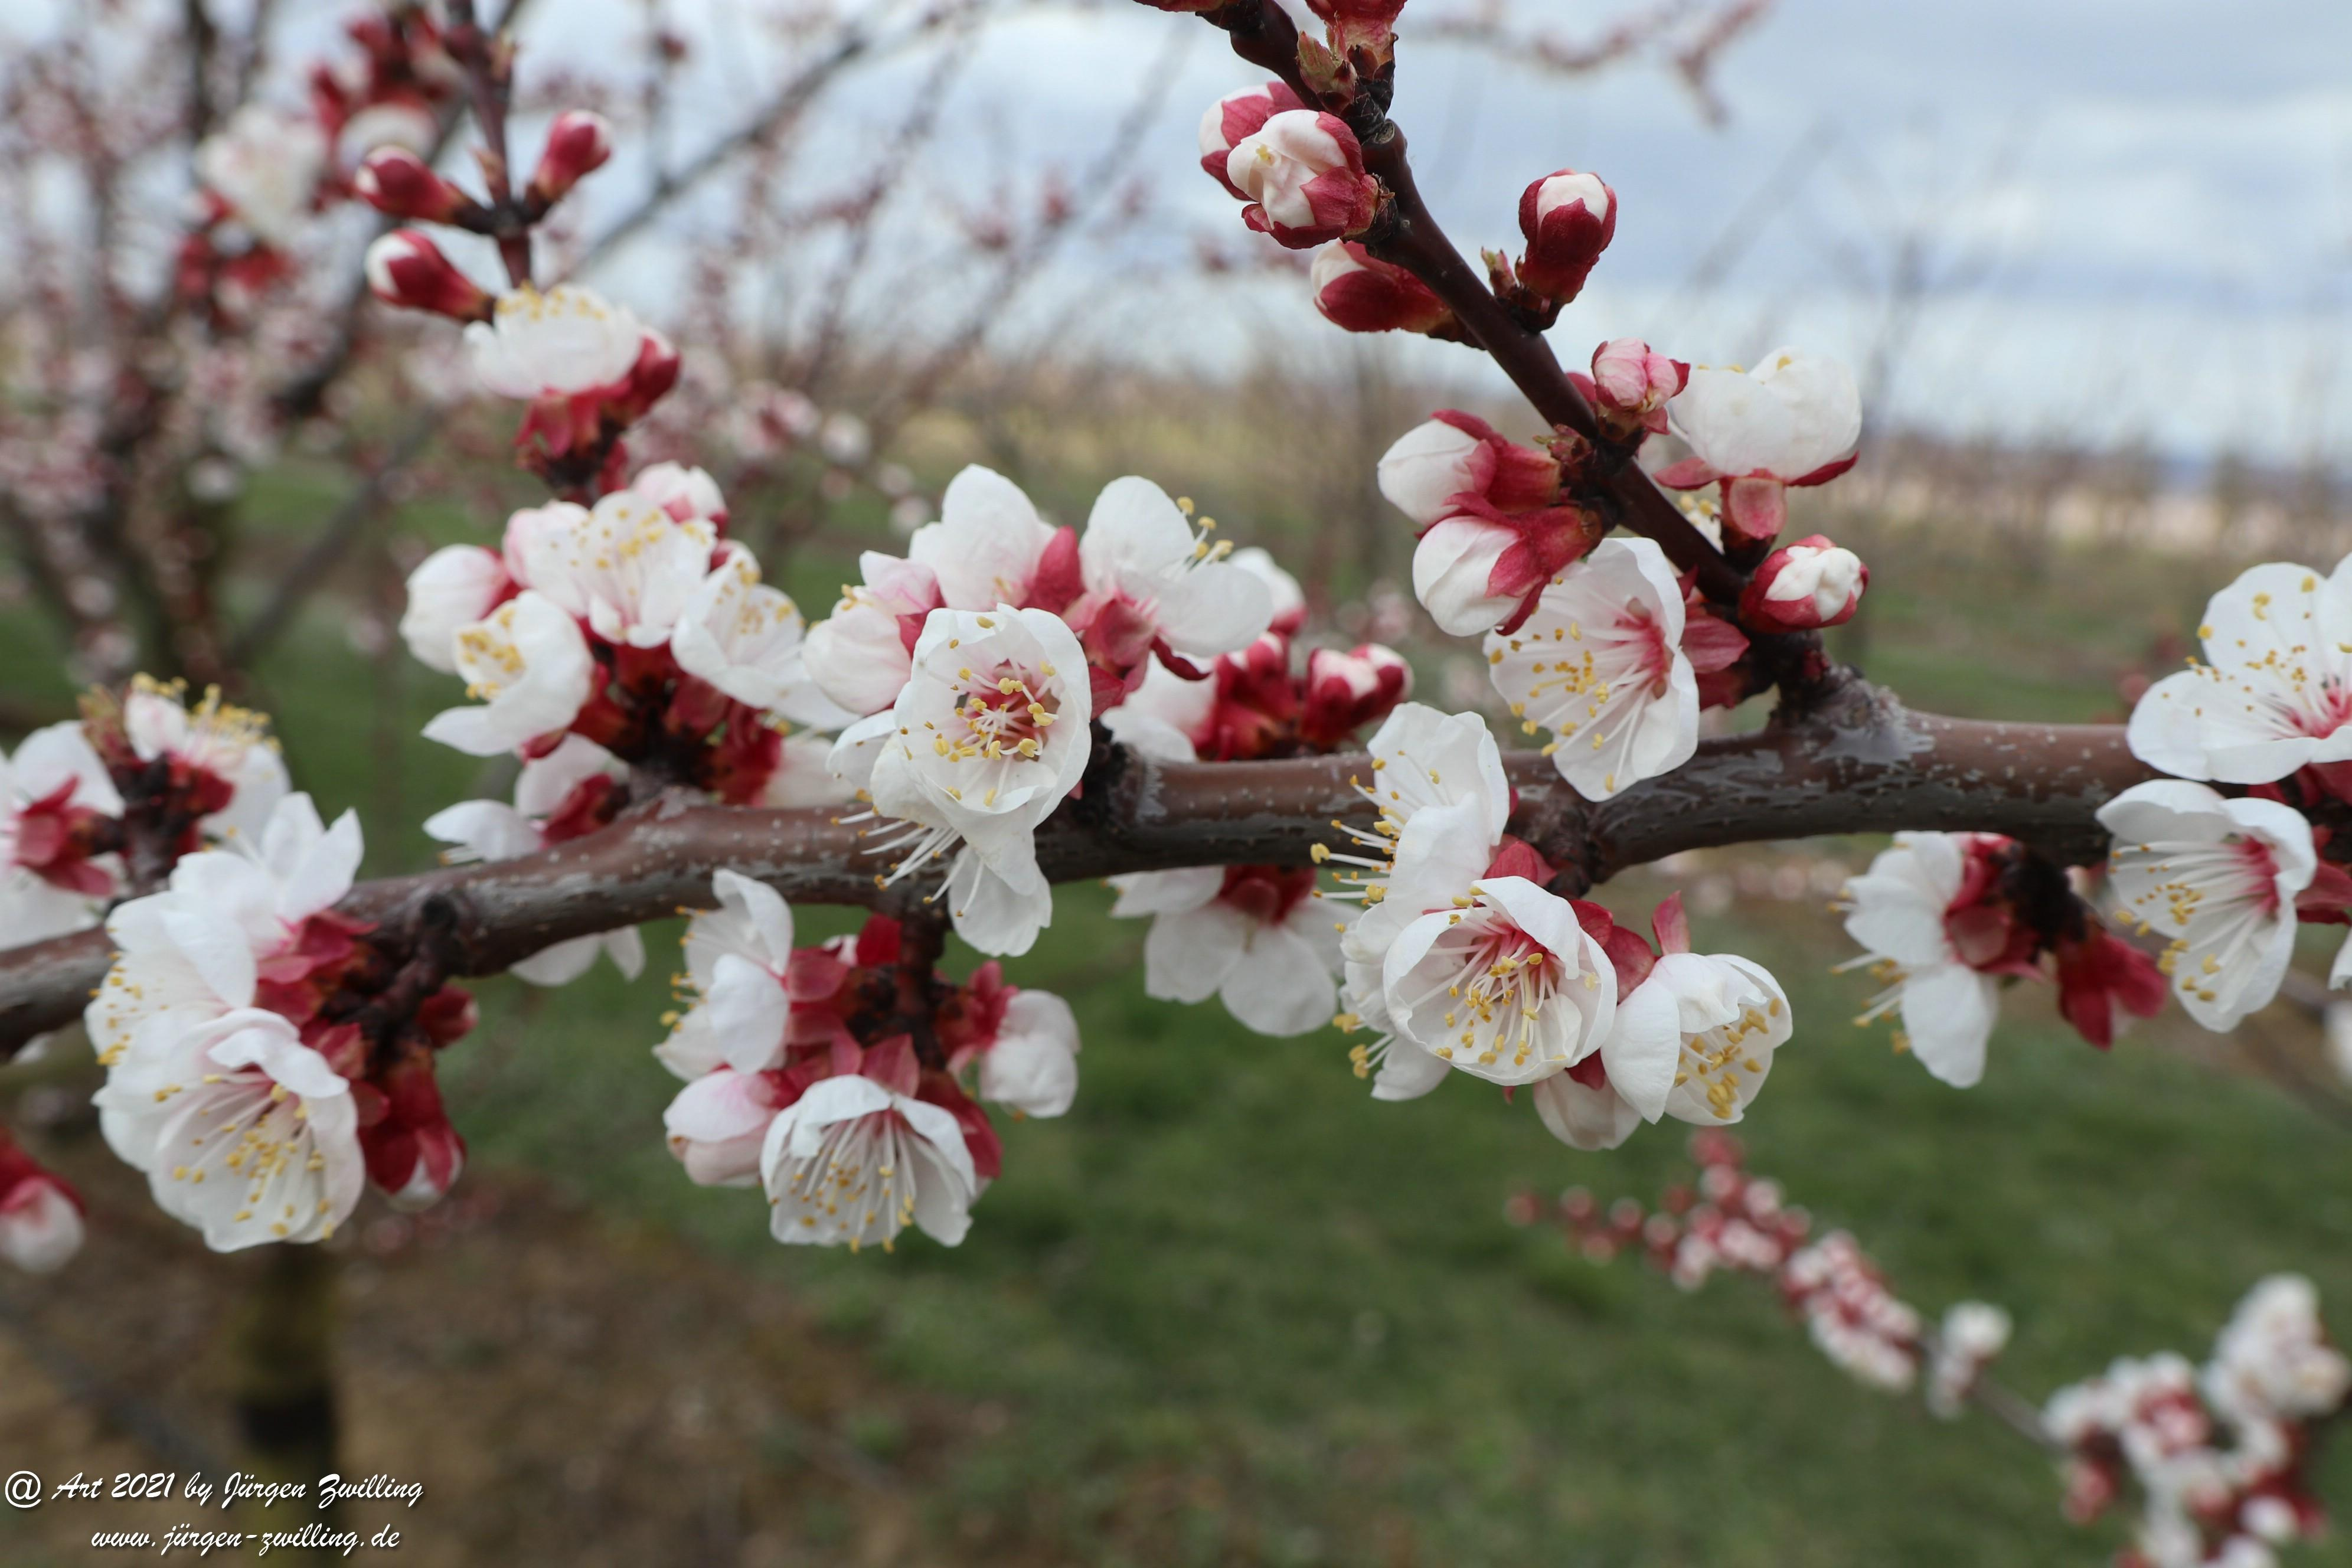 Aprikosenblüte 20